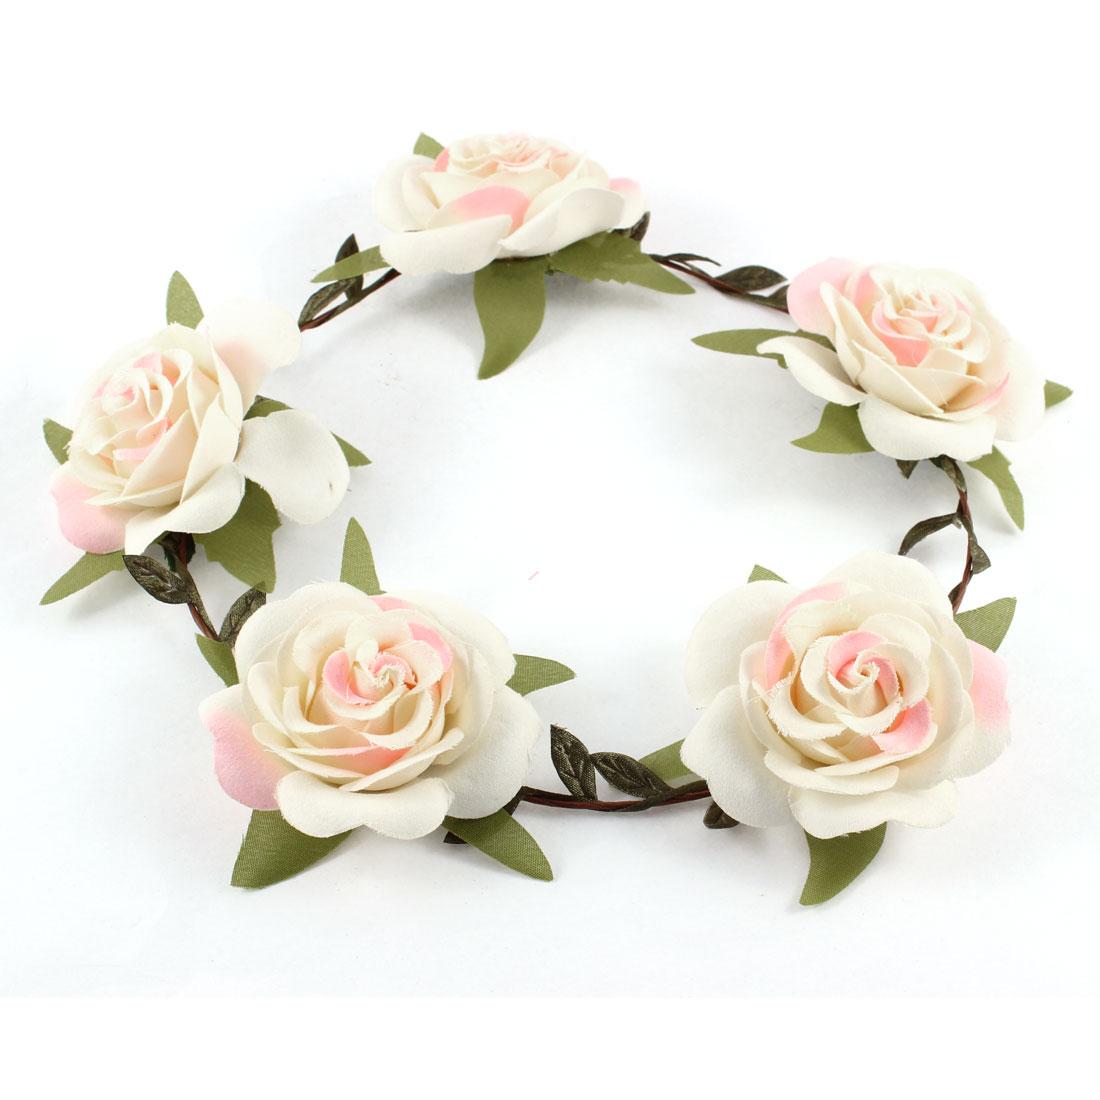 Woman White Flower Headband Head Wreath Hair Accessory